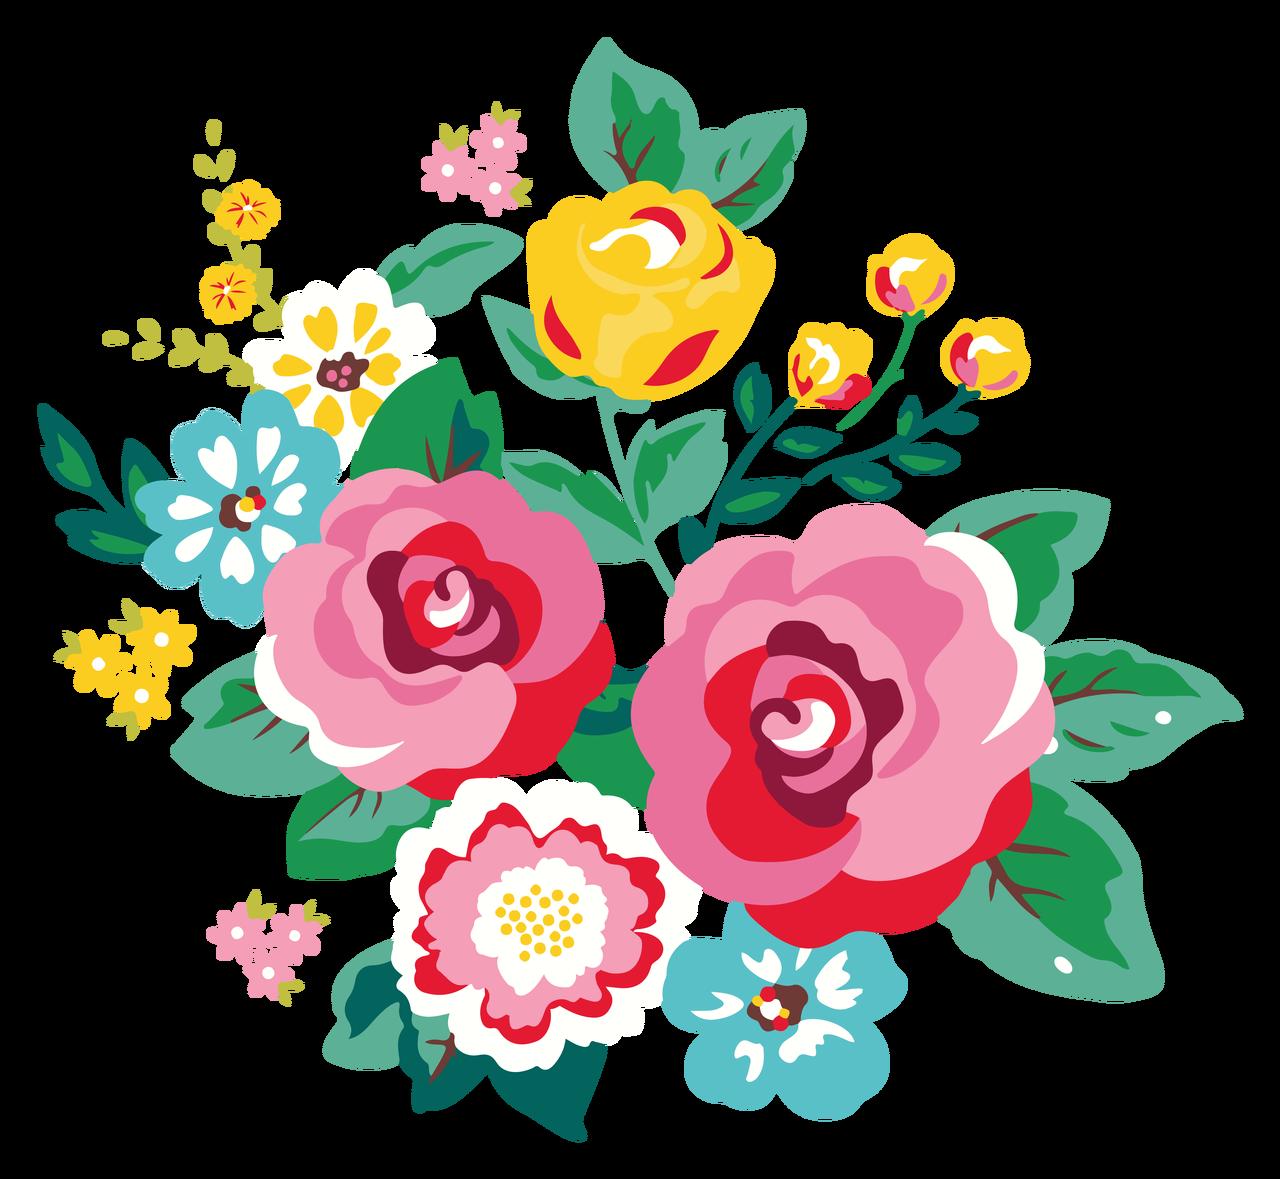 Flower Bunch #2 Print & Cut File